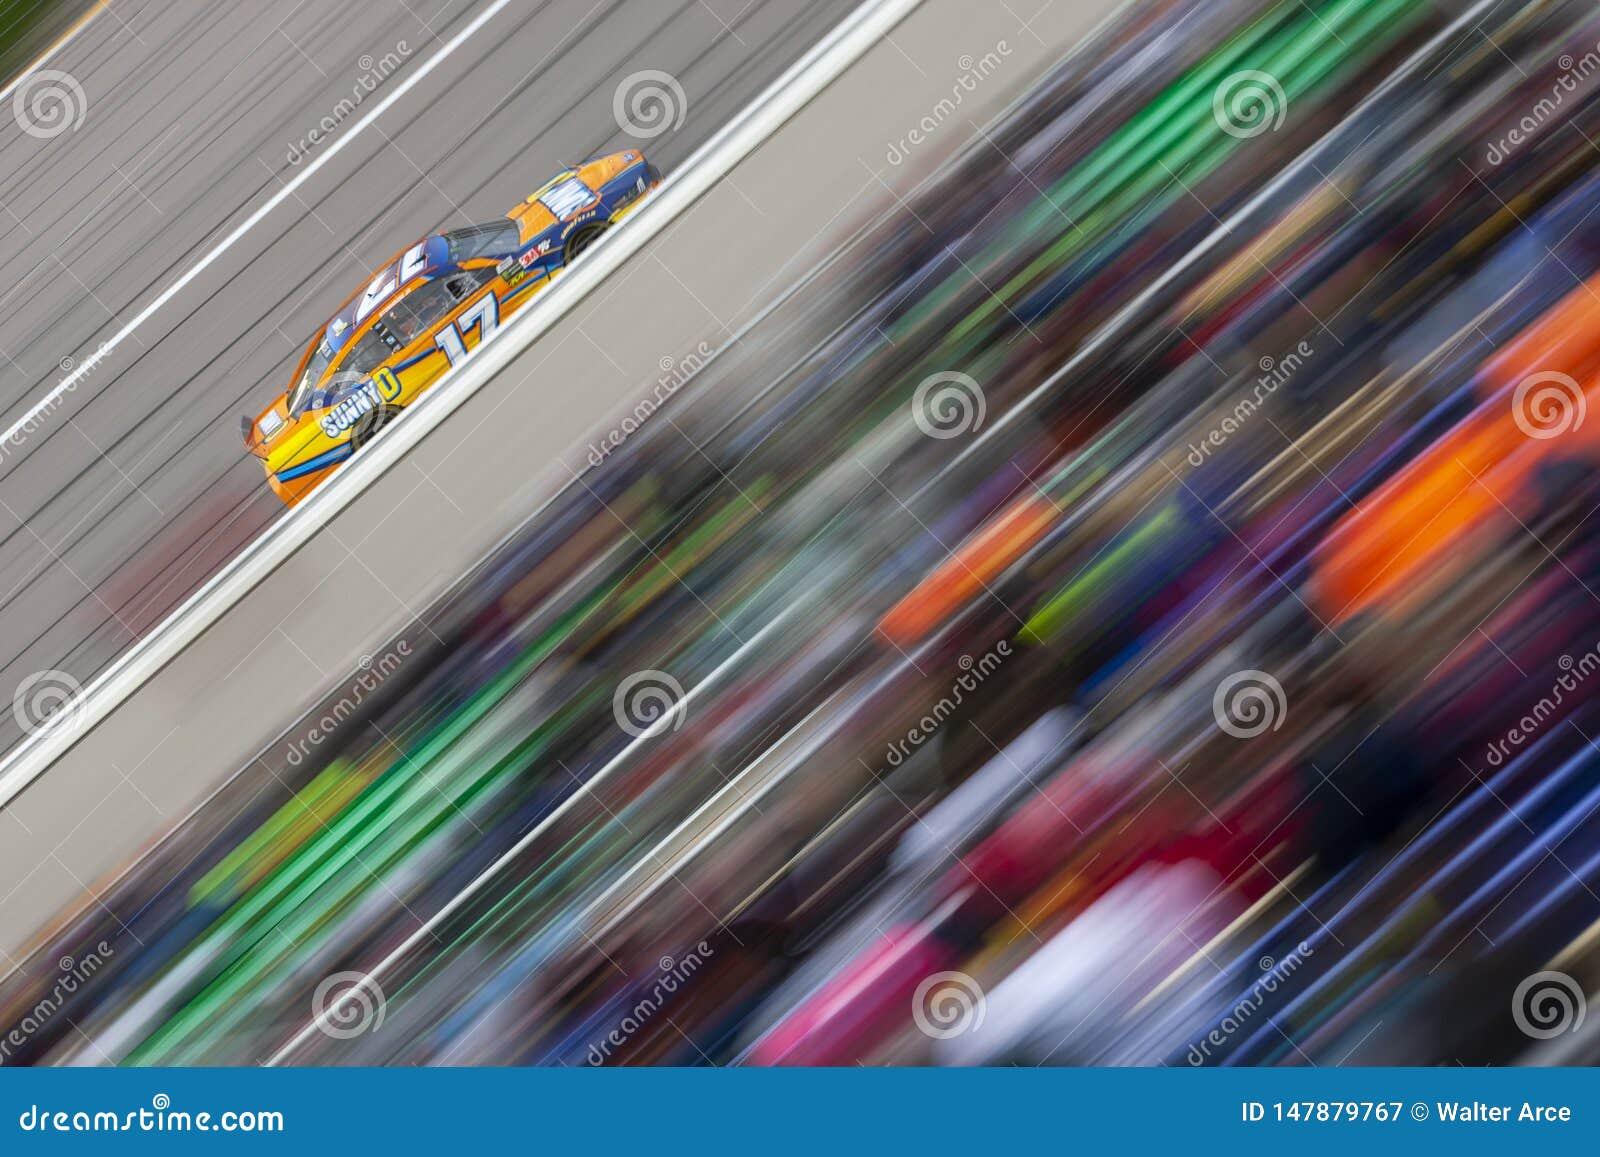 NASCAR: May 11 Digital Ally 400